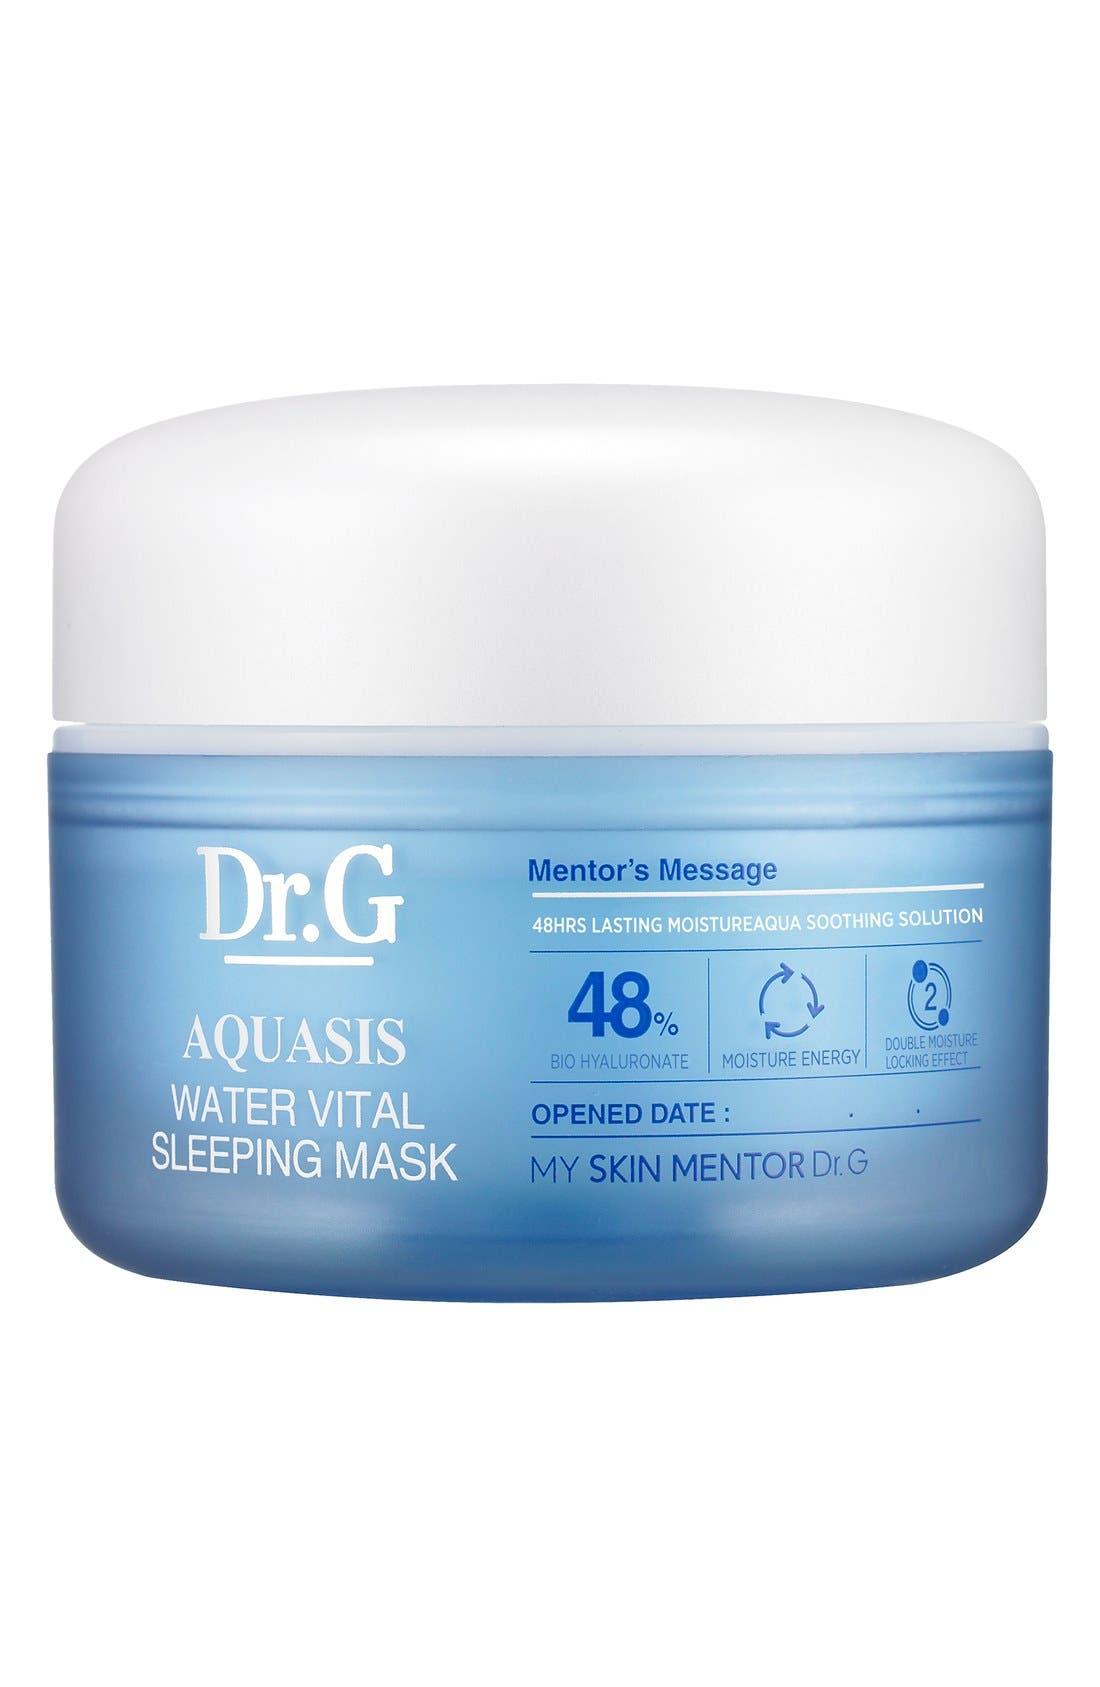 My Skin Mentor Dr. G Beauty Aquasis Vital Sleeping Mask